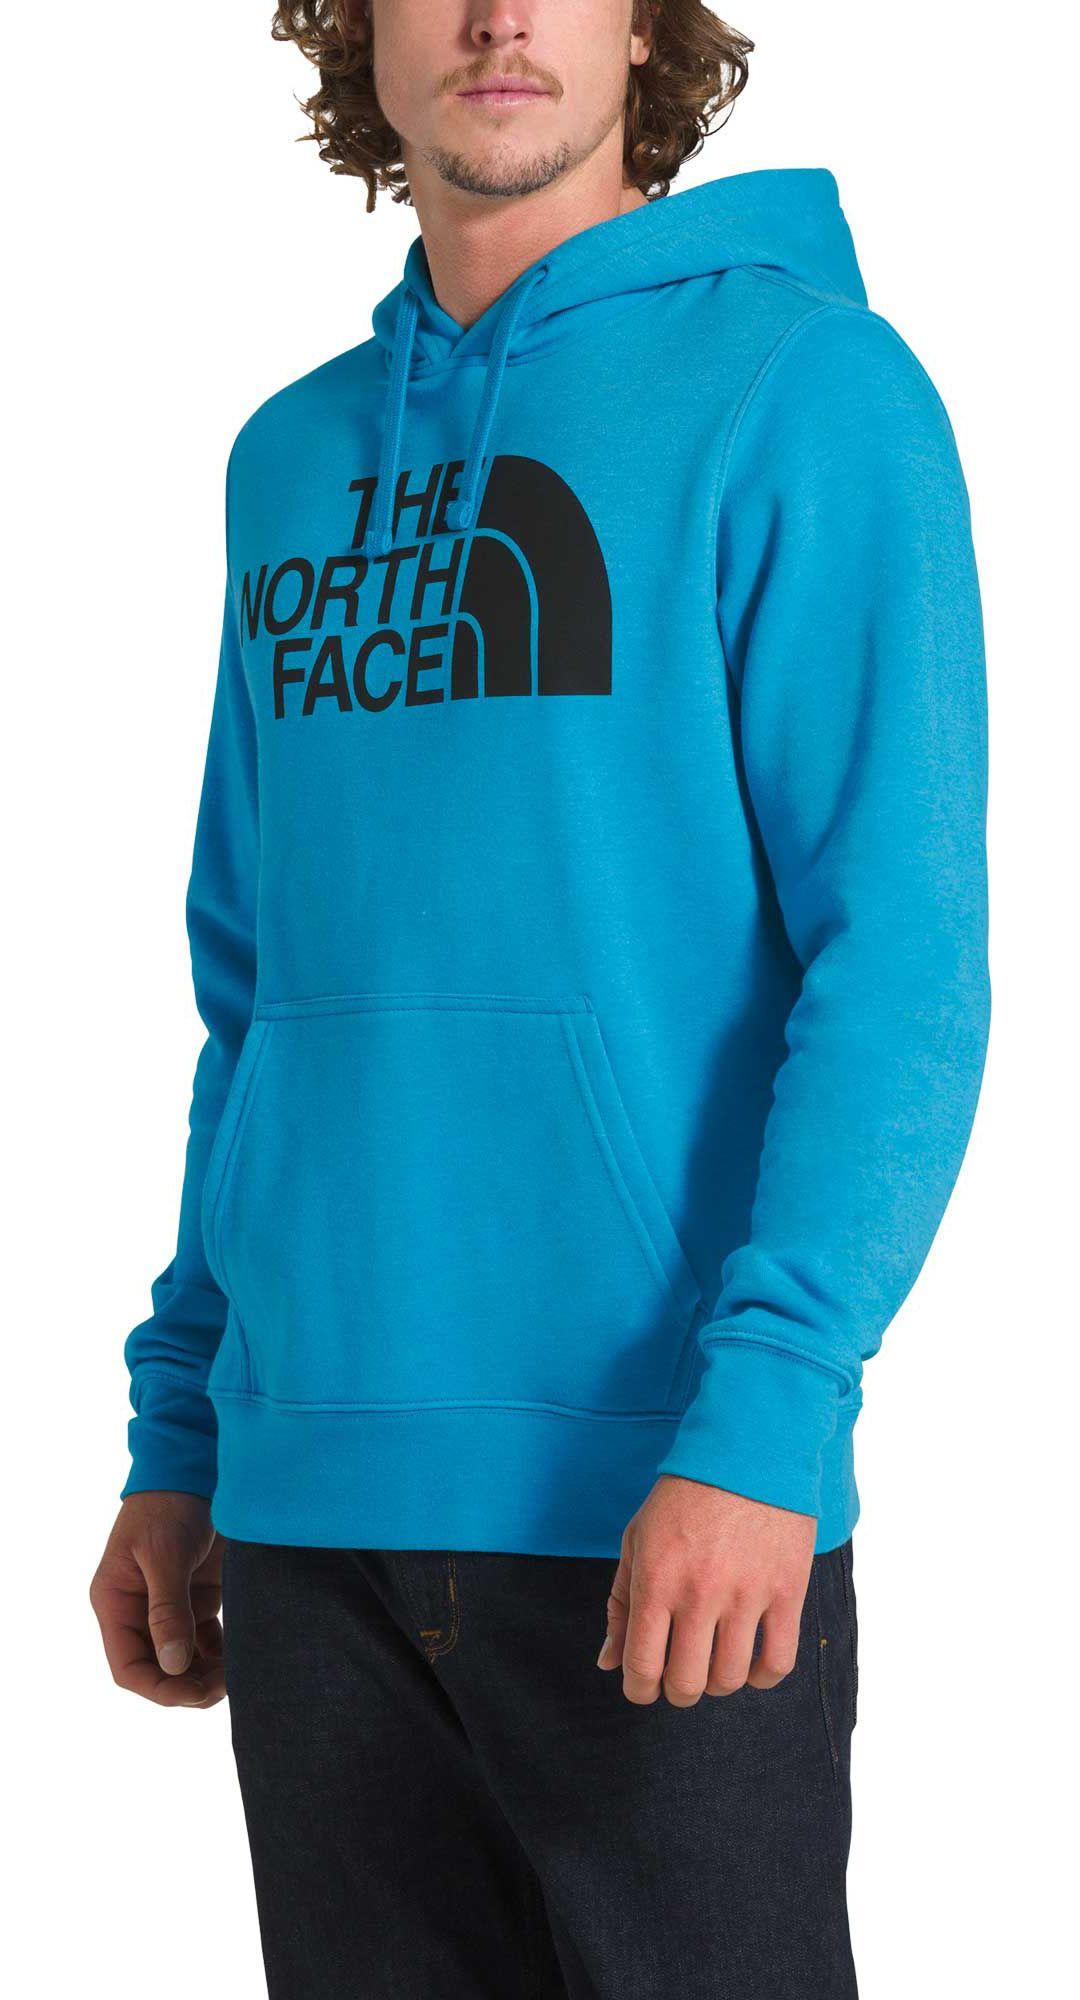 a69ea38f4 The North Face Men's Half Dome Hoodie